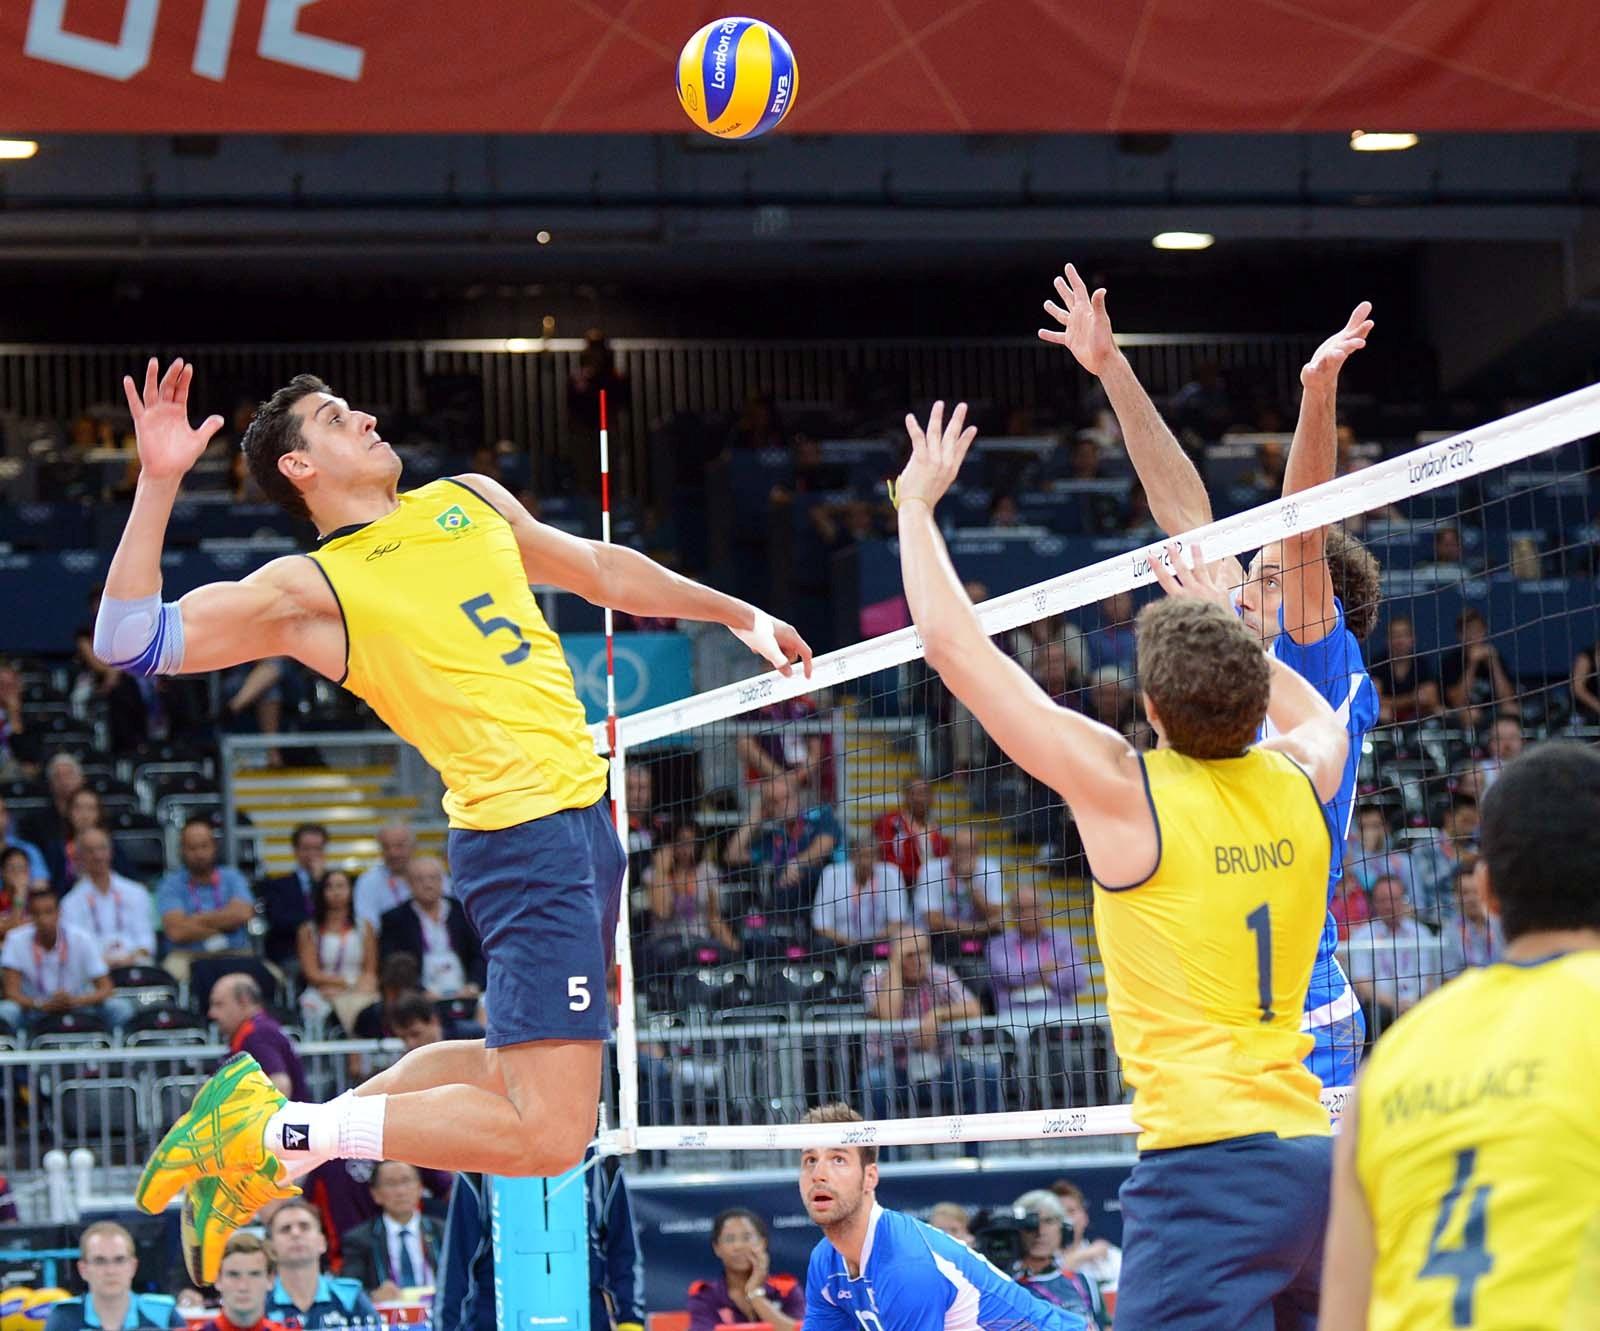 Jogos olimpicos rio 2016 - 3 part 10